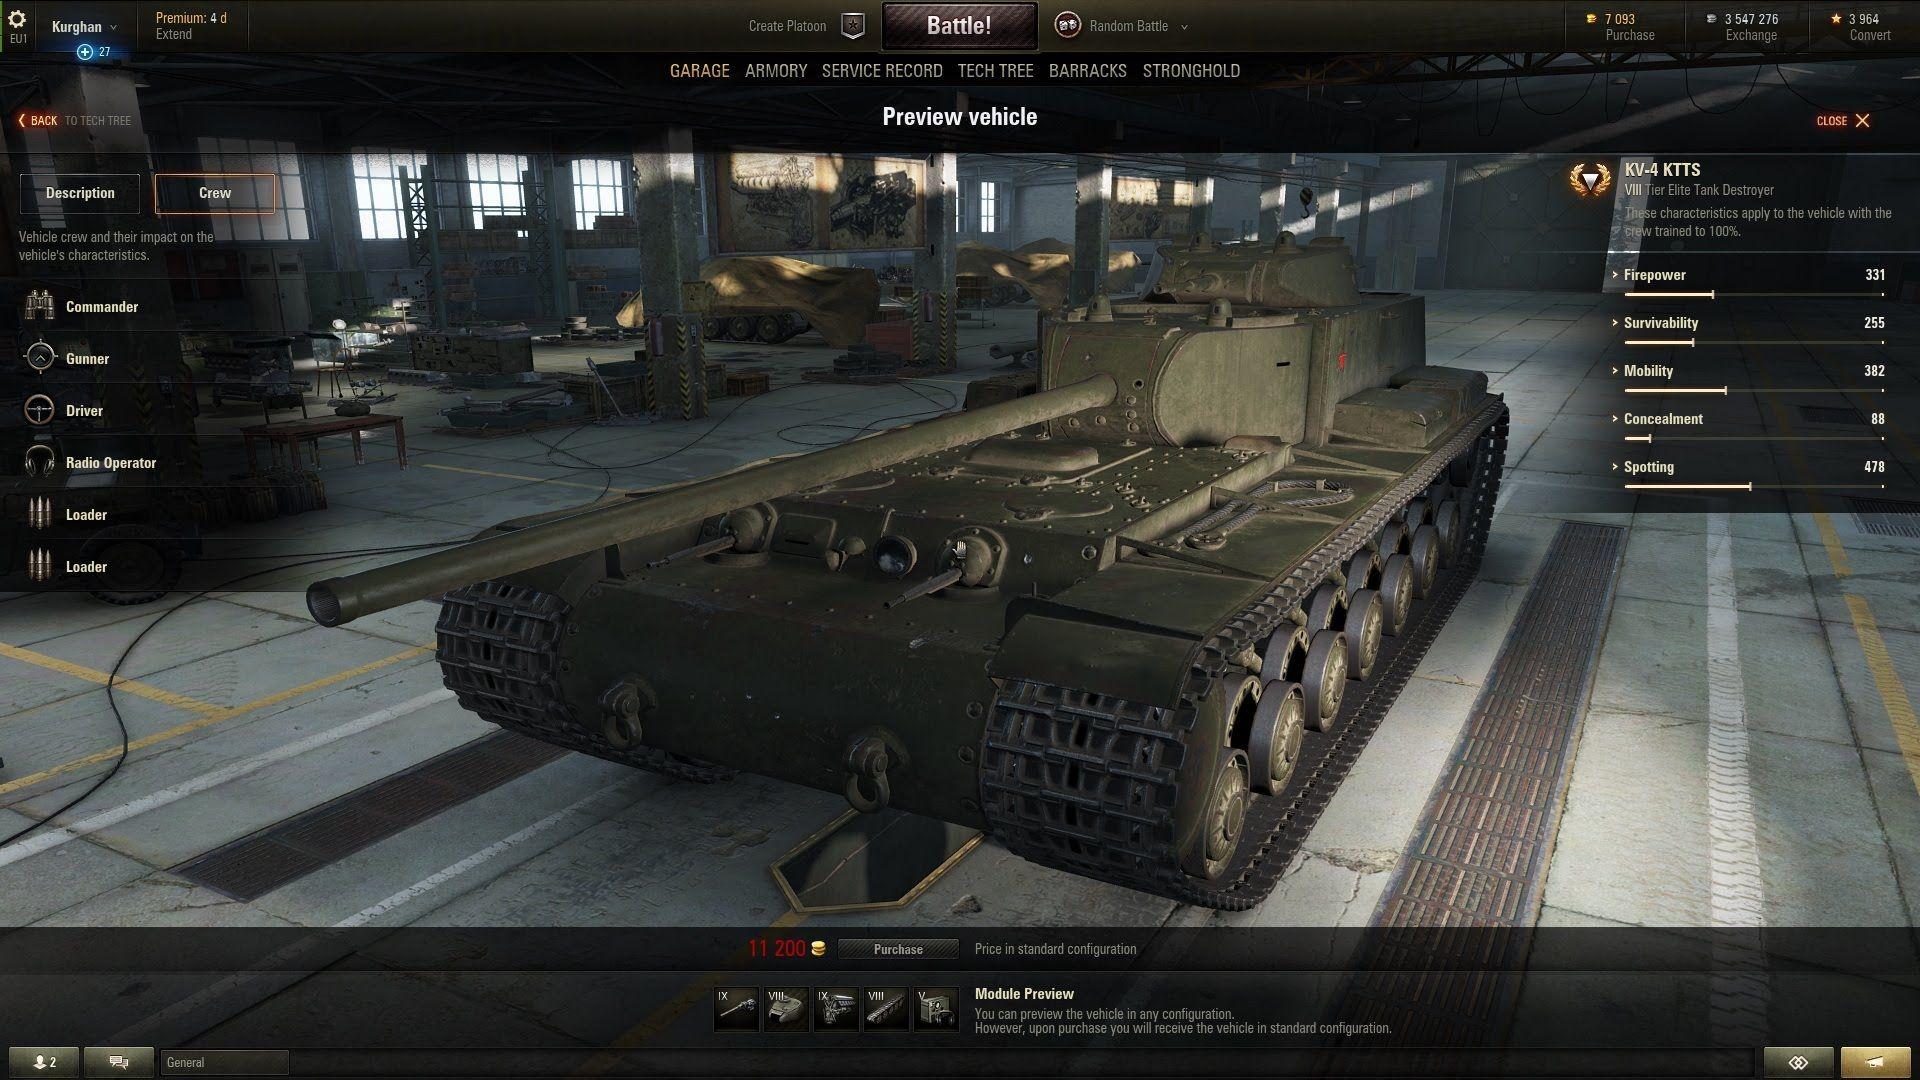 e53ddfe8b7d72dc76cf388f0dec41b1b - How To Get Premium Tanks In World Of Tanks